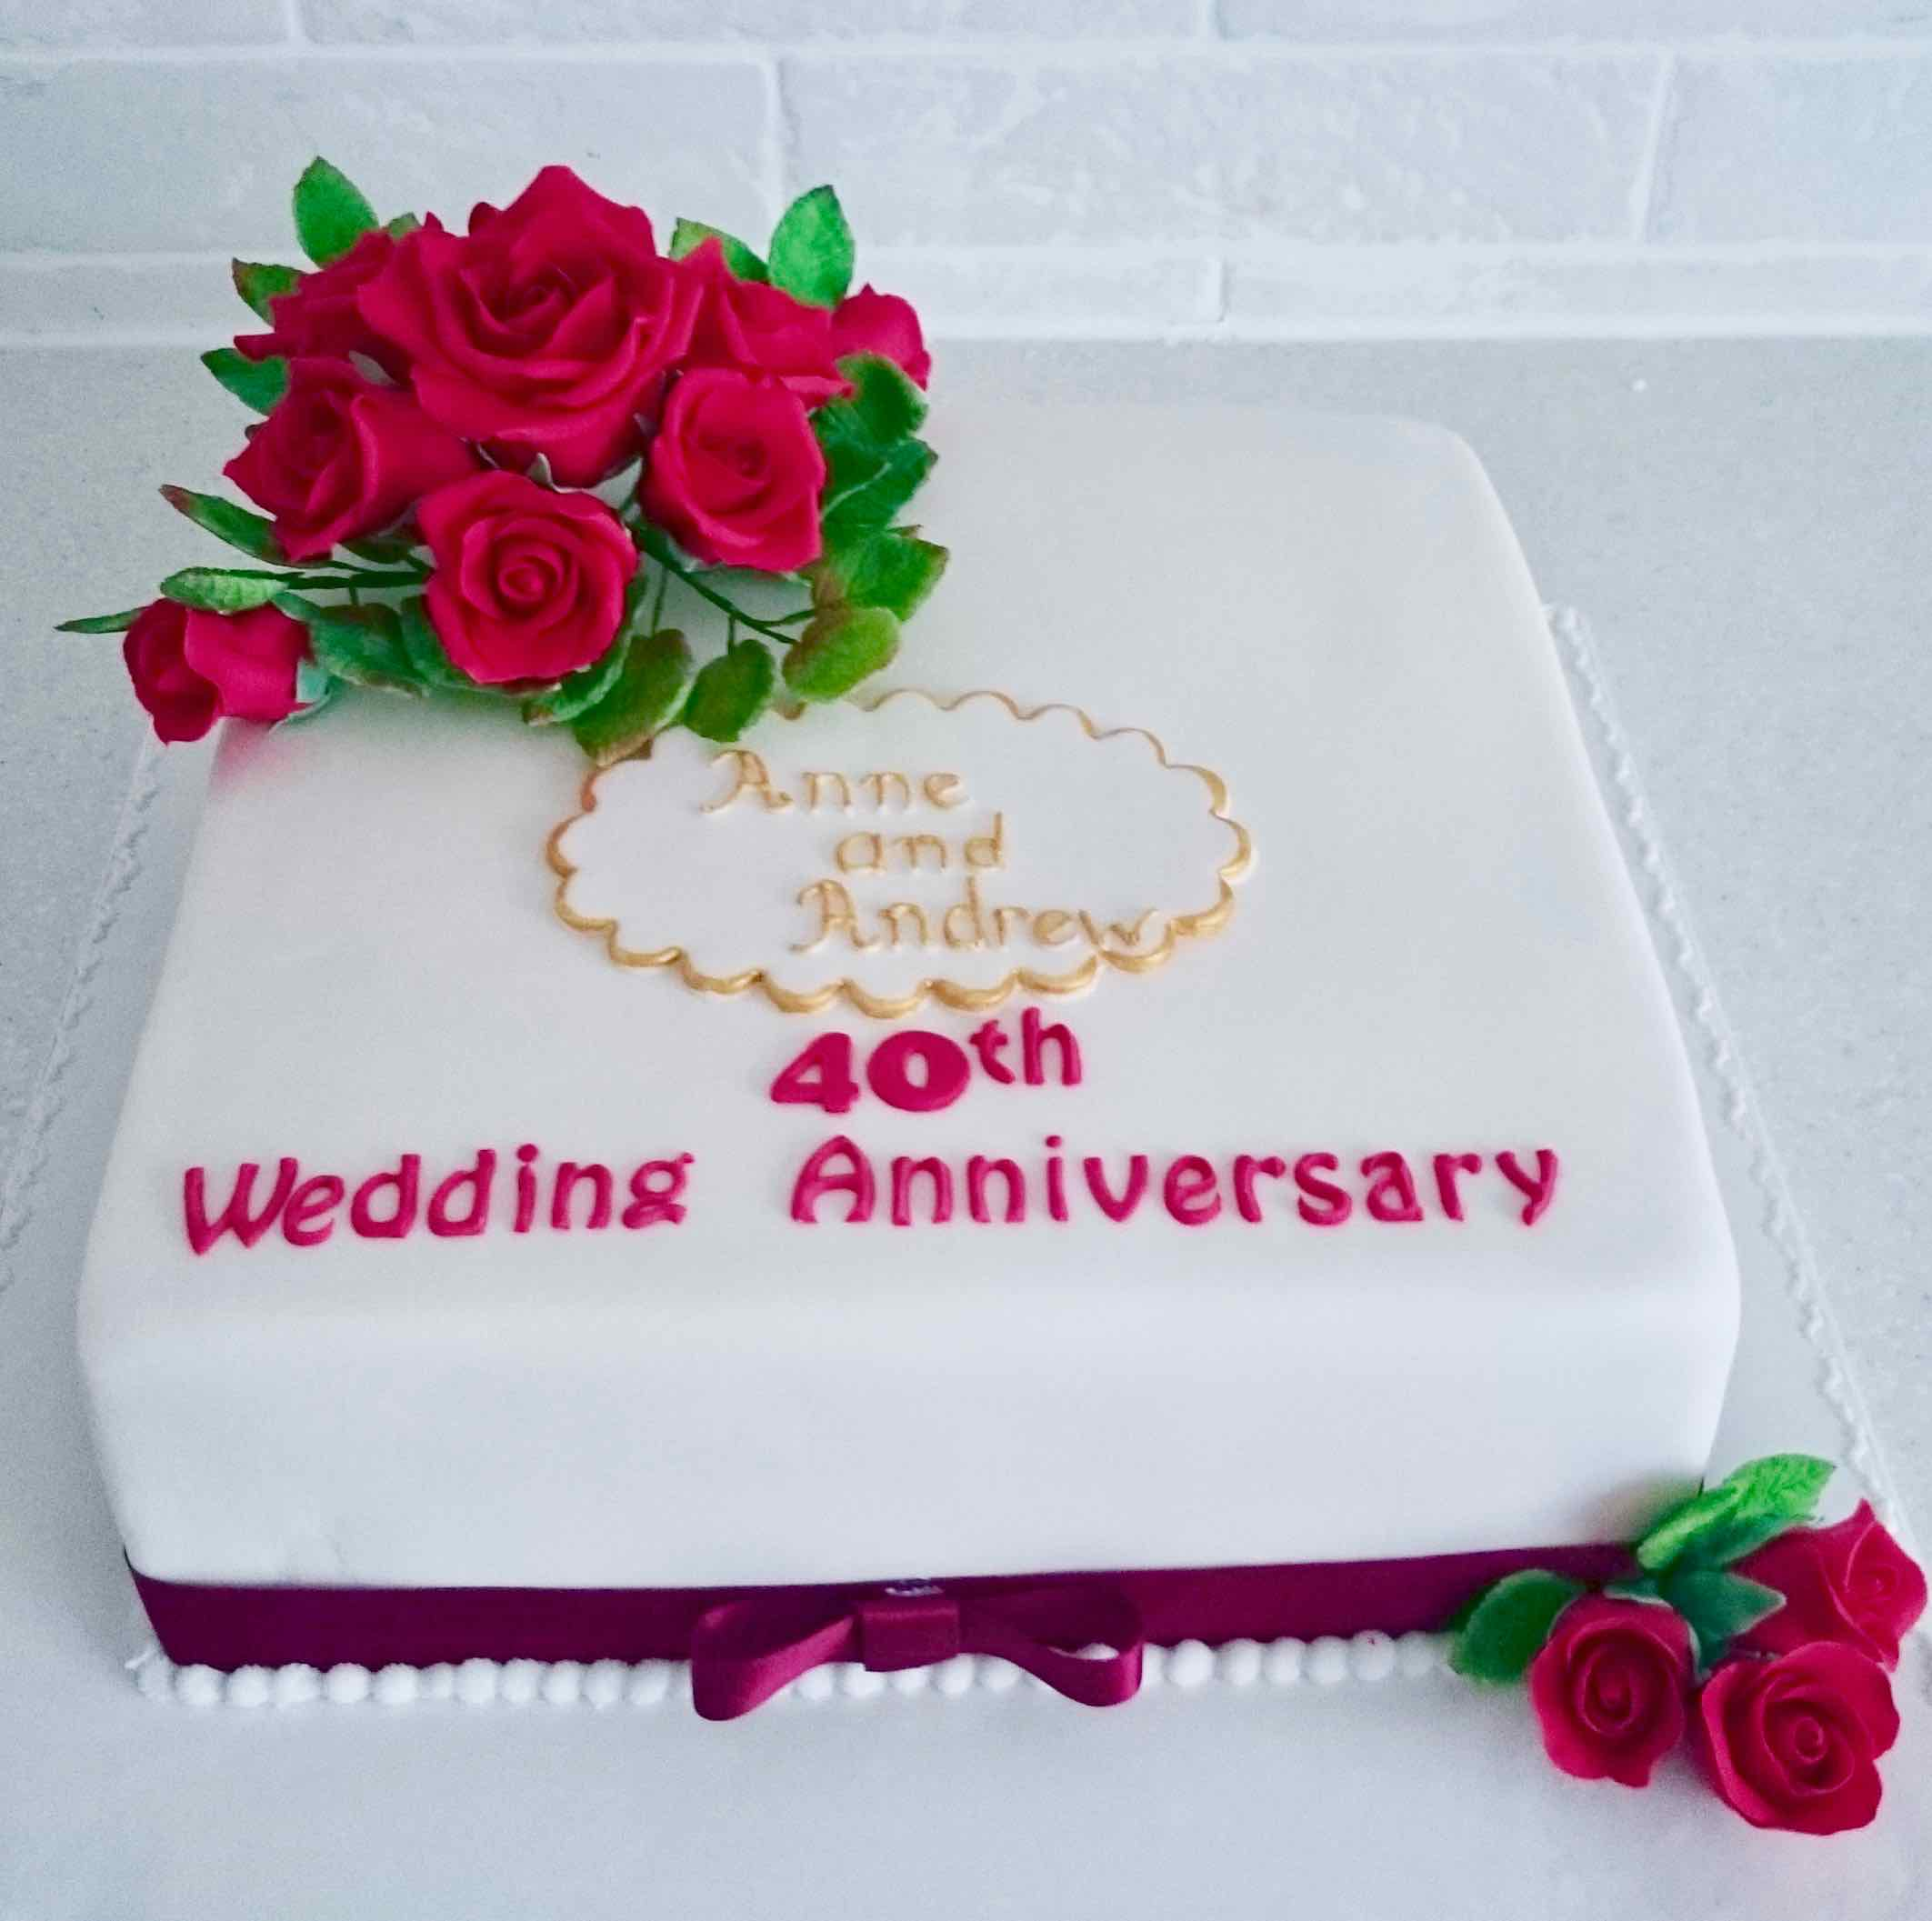 40th wedding anniversary cake by Serendipity Cake Company ...